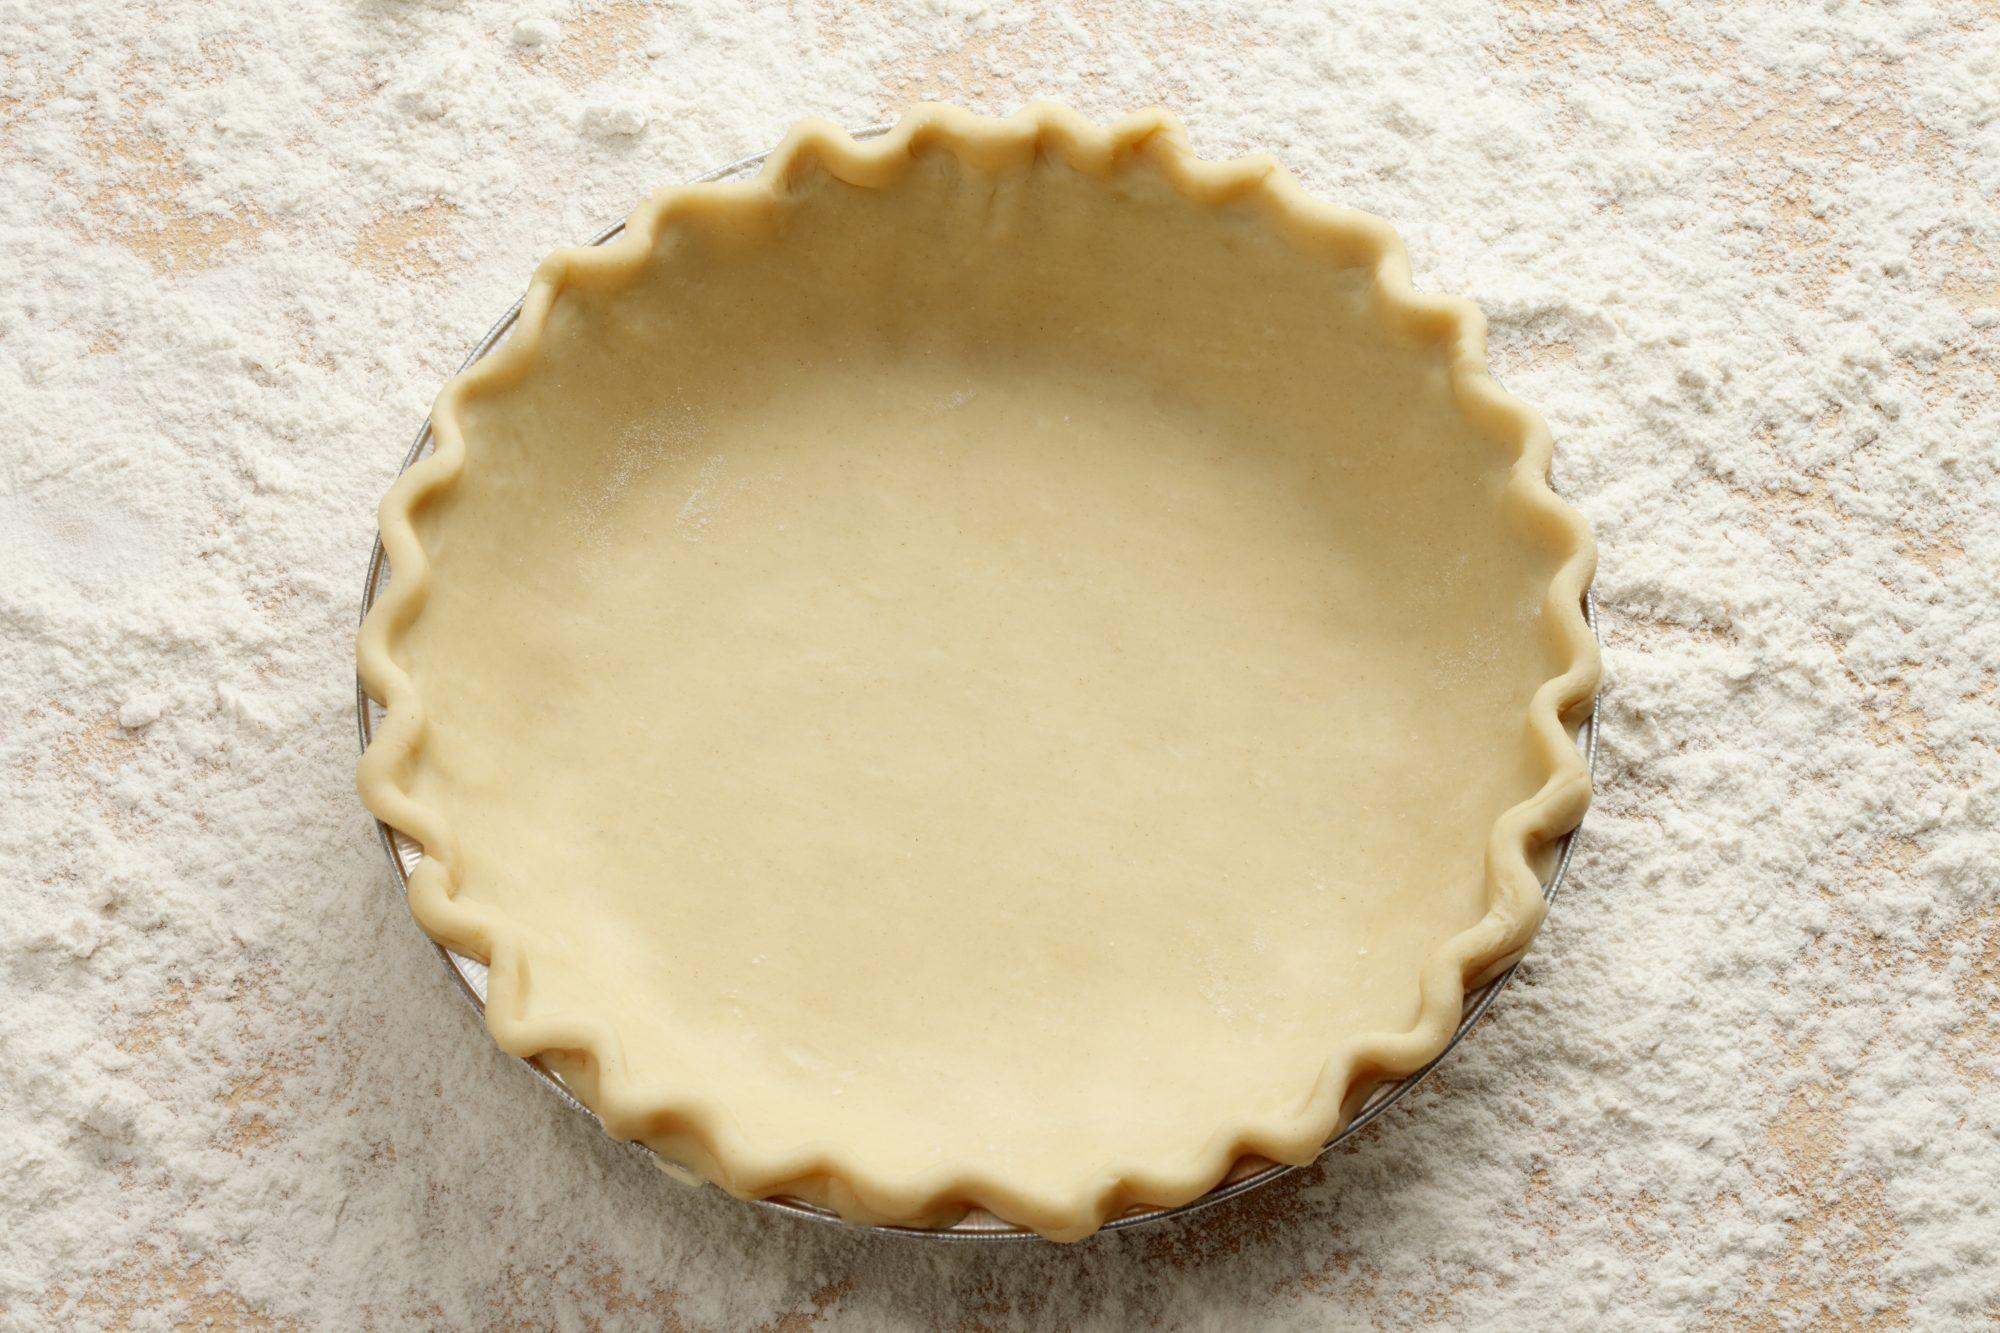 Empty Pie Crust with flour background